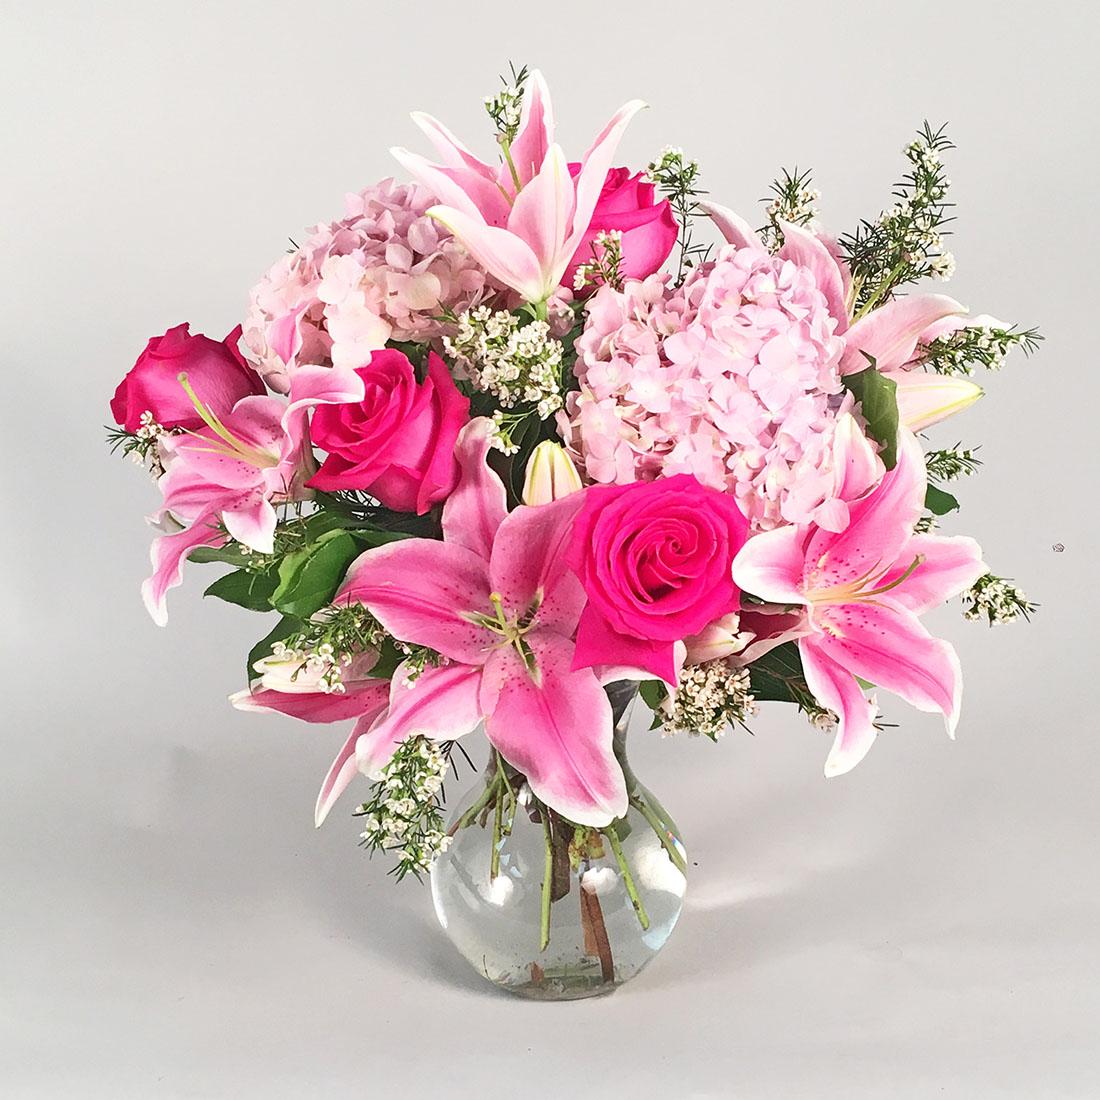 Precious Pinks Morning Glory Flower Shop